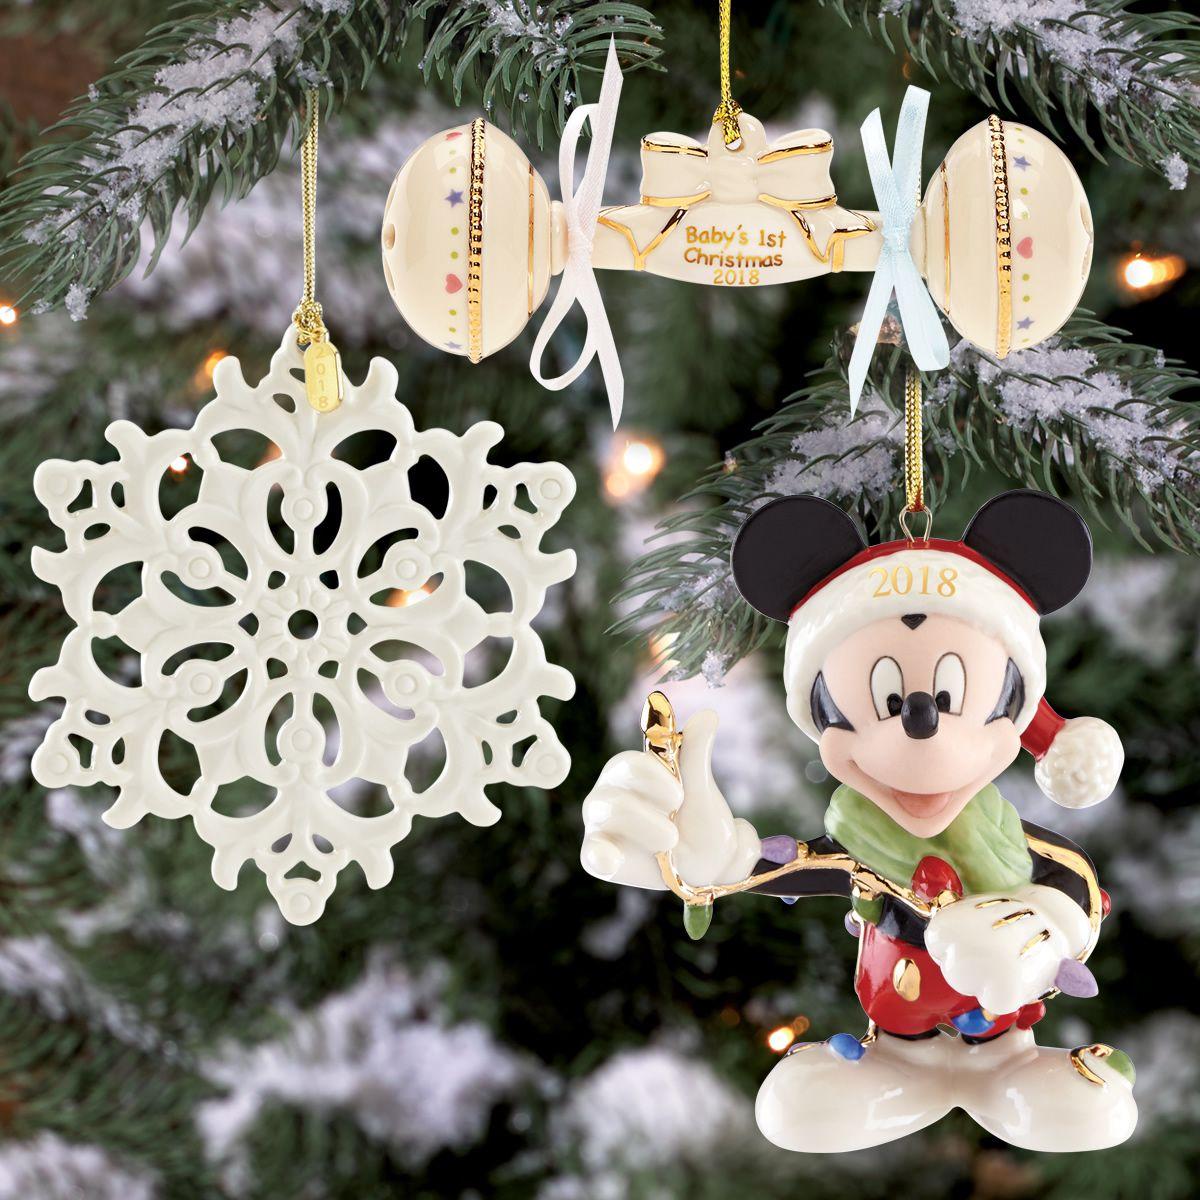 ce23c41b0a3 Lenox Christmas Ornaments - Macy s